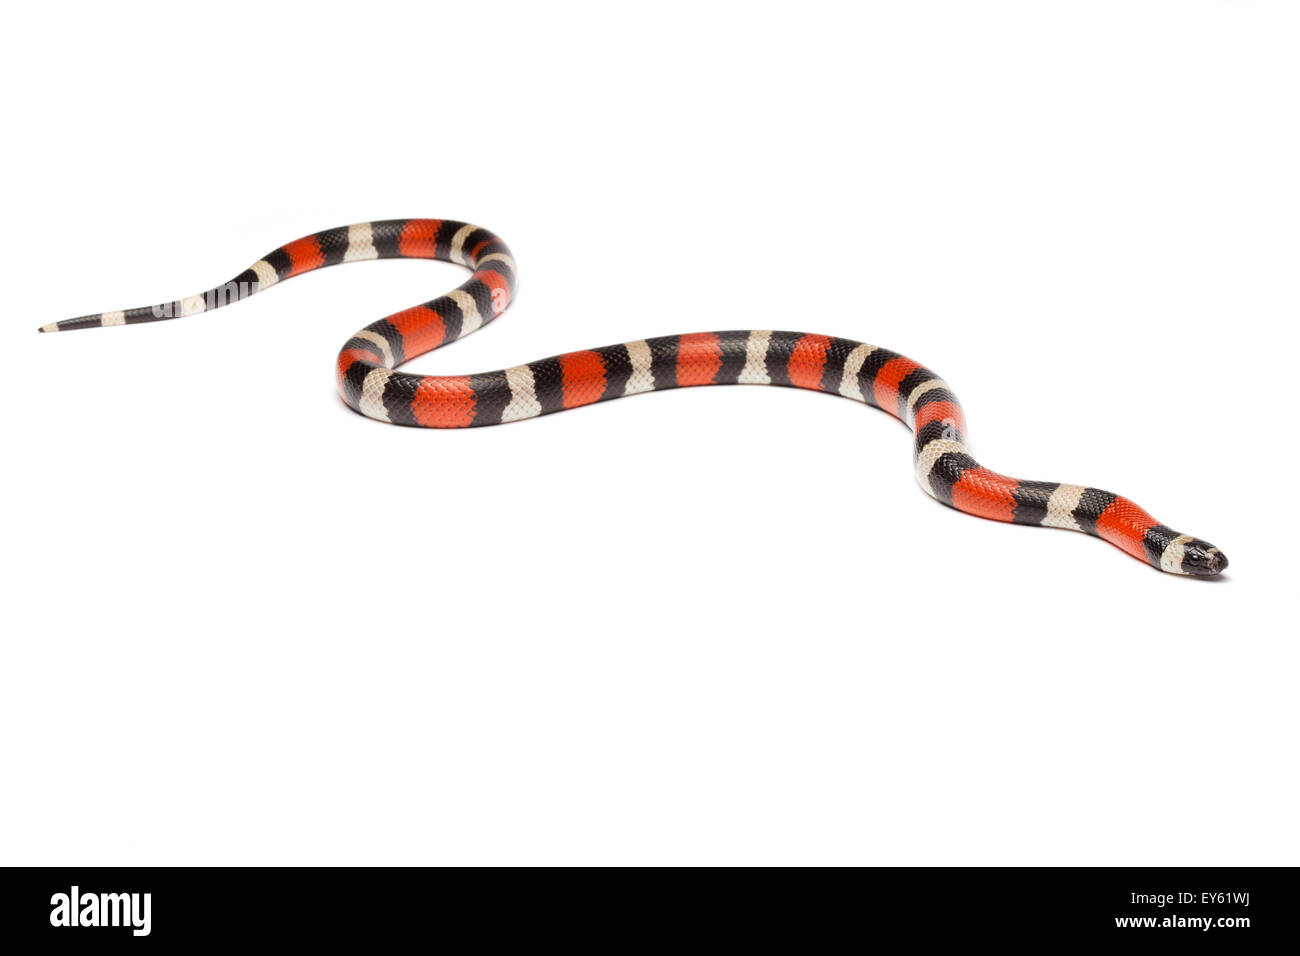 Puebla Milk Snake on white background - Stock Image